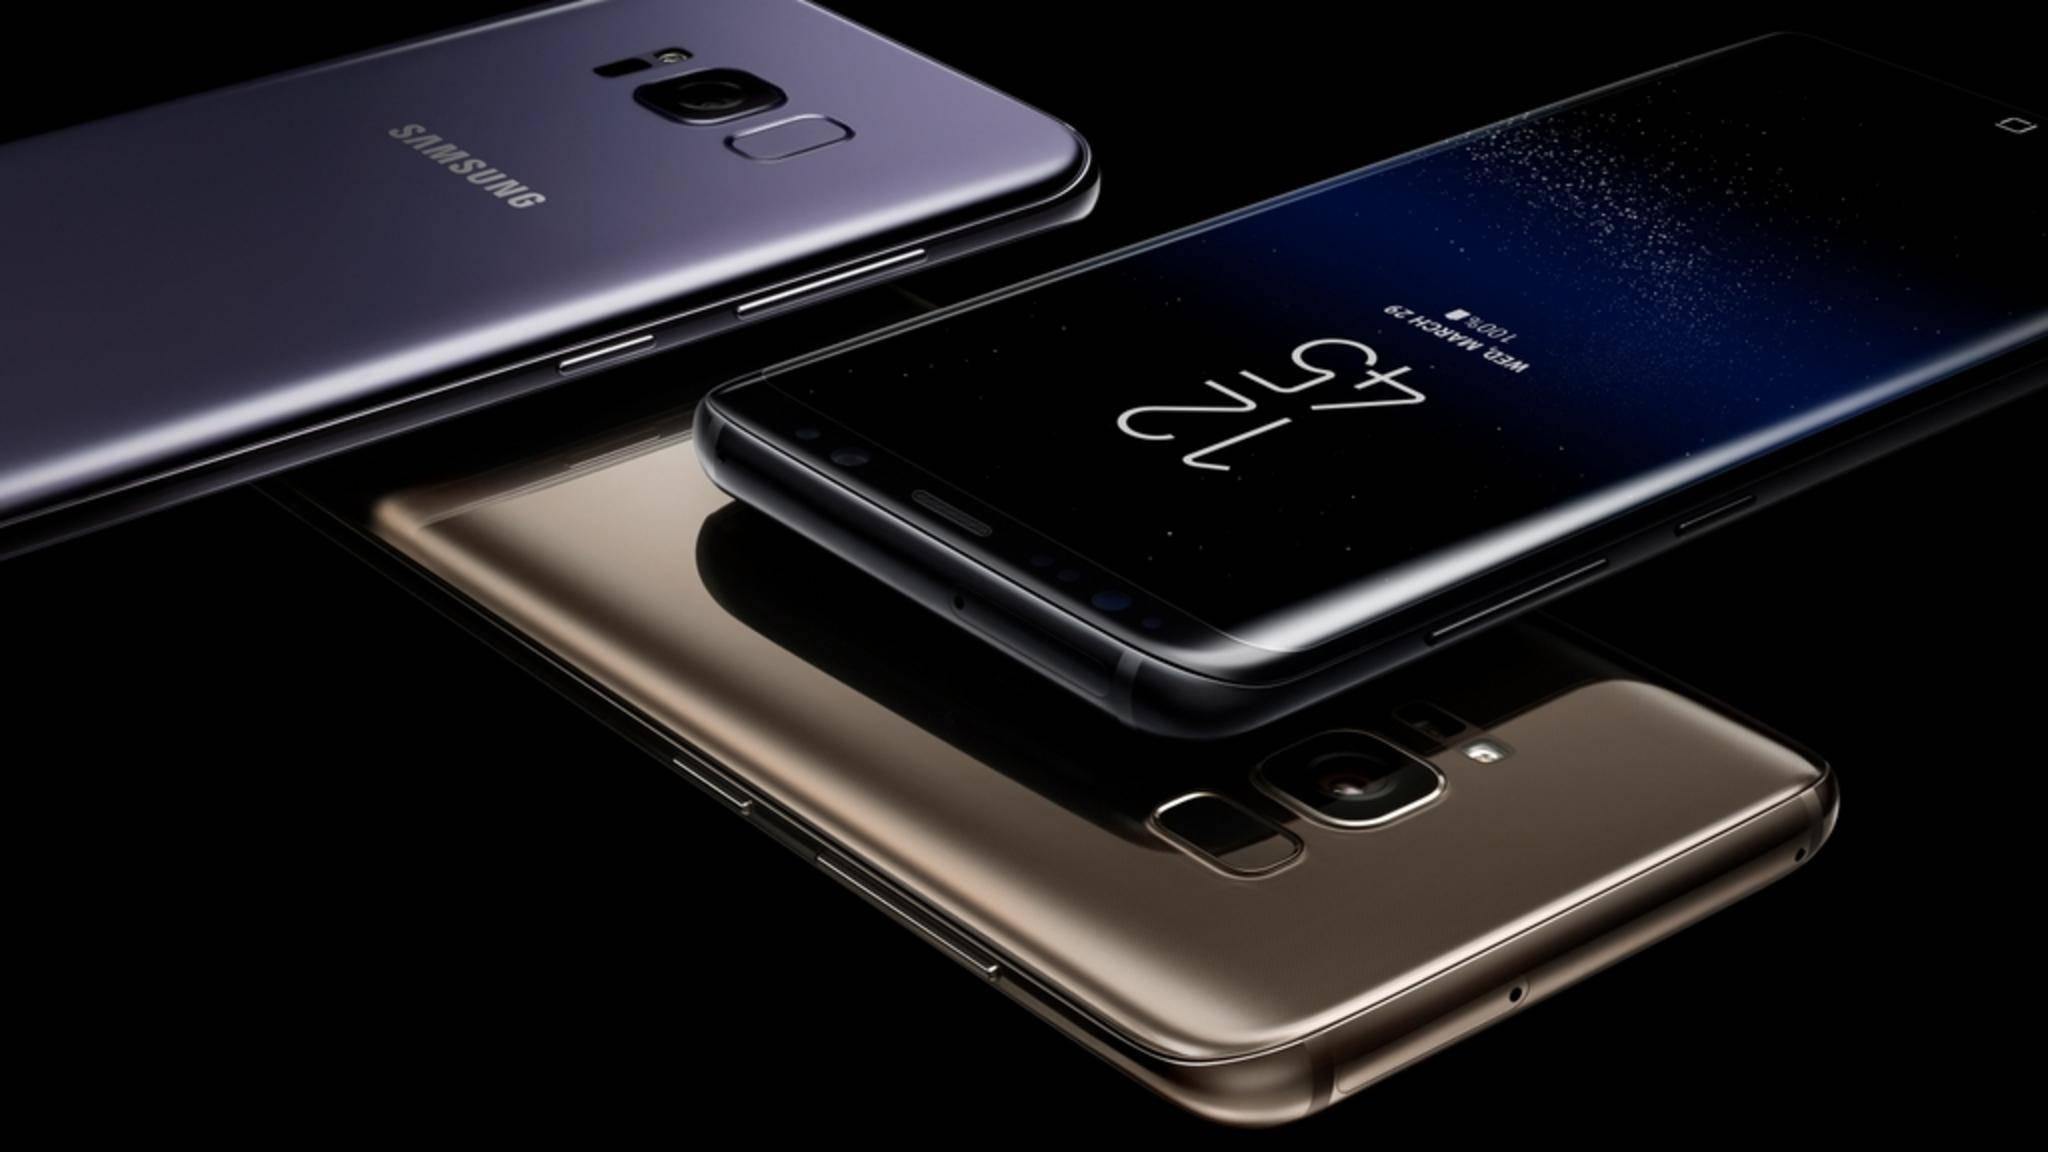 Das Galaxy S8 hat ein nahezu randloses Display.